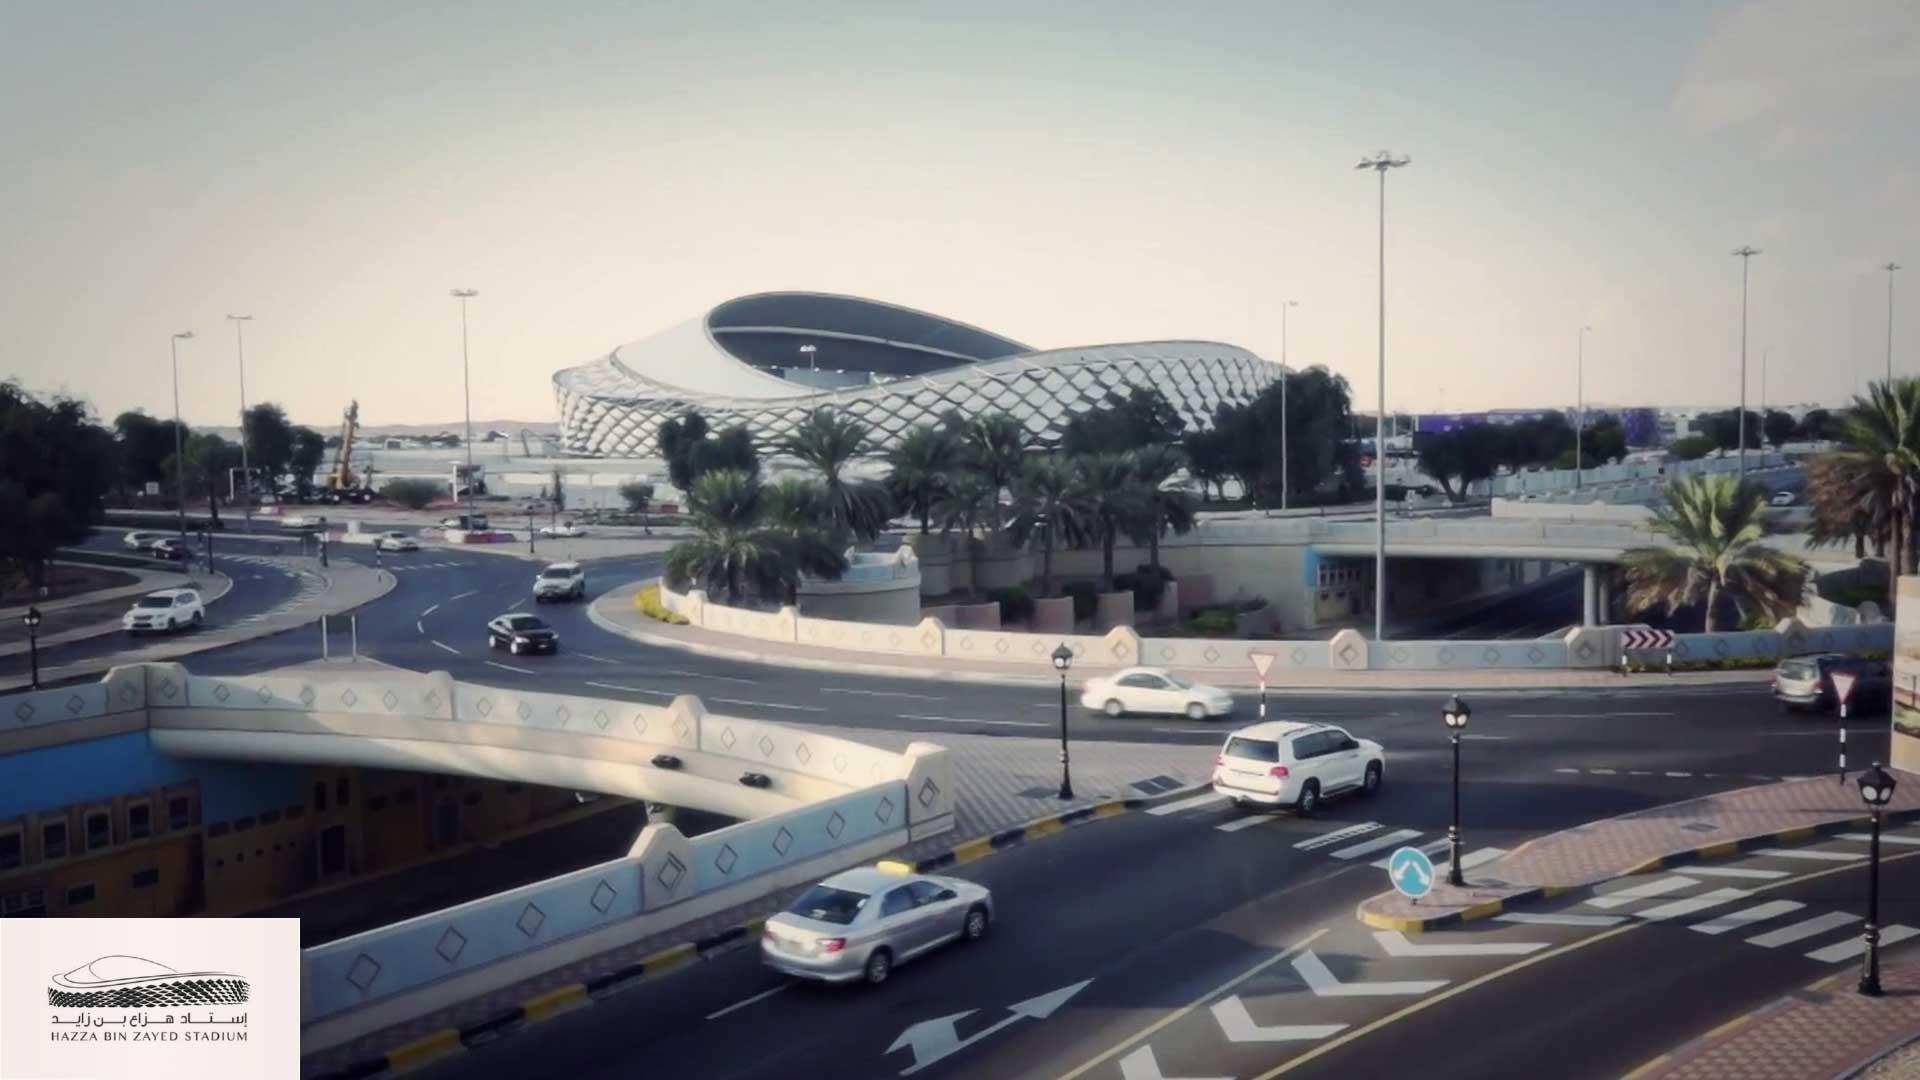 Ahly VS Zamalik Game - Promotional Video - Al Ain Club Investment Company